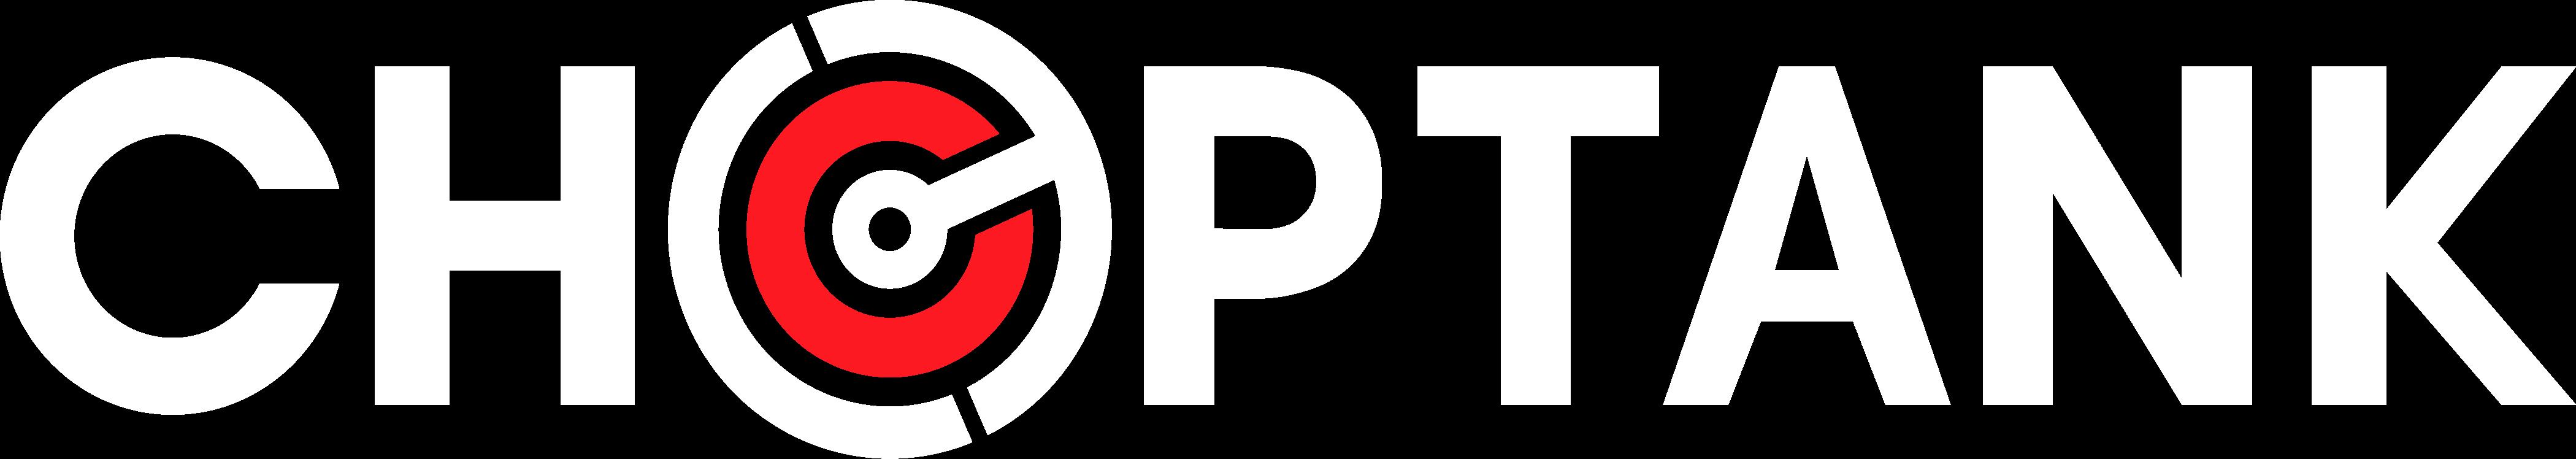 Choptank Transport